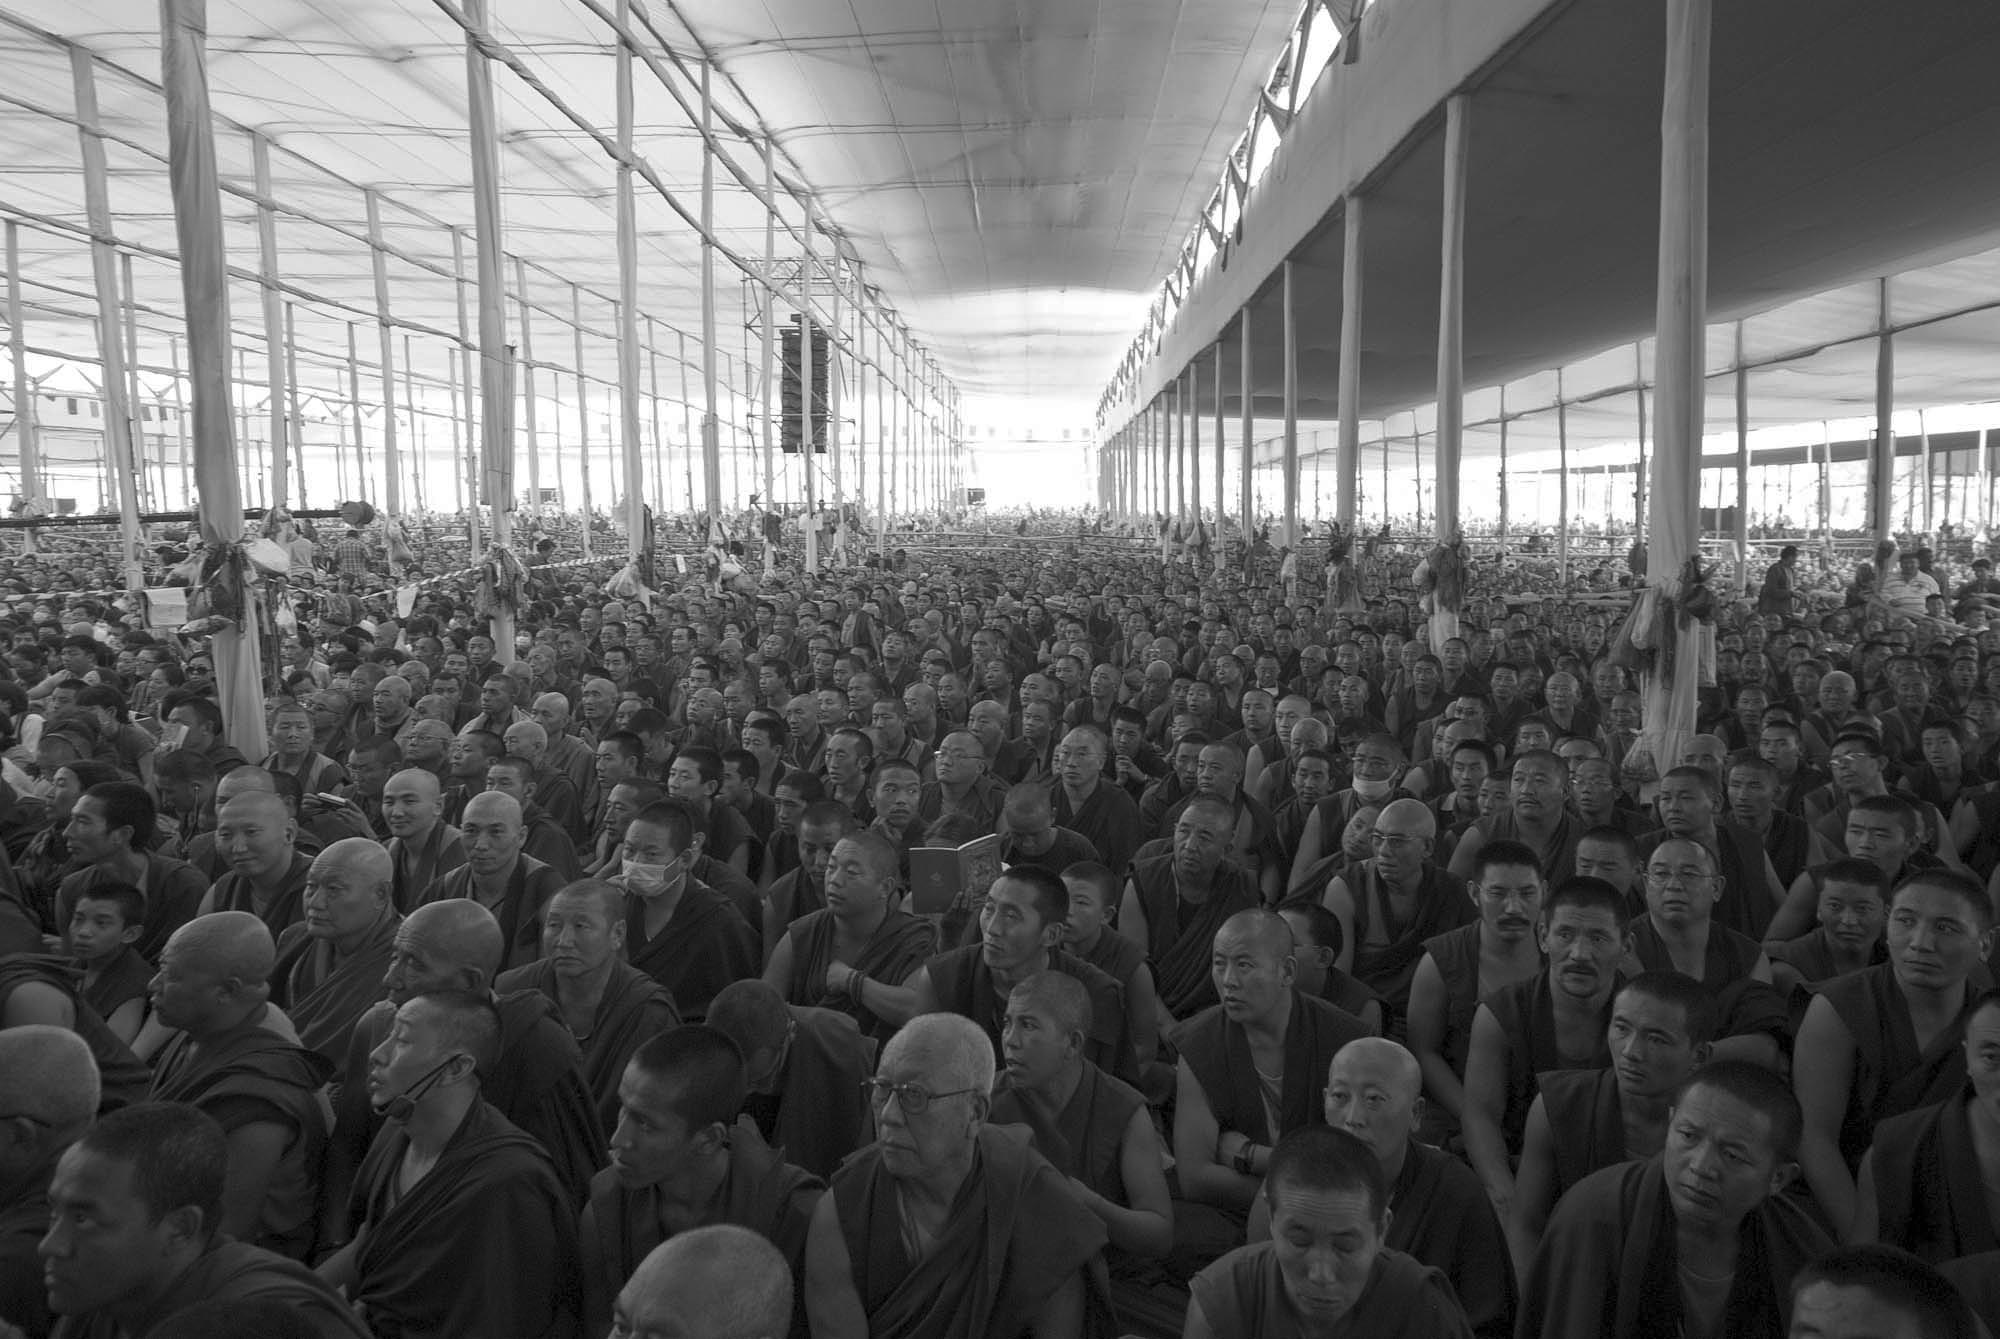 Tibetan Stories - The photographs